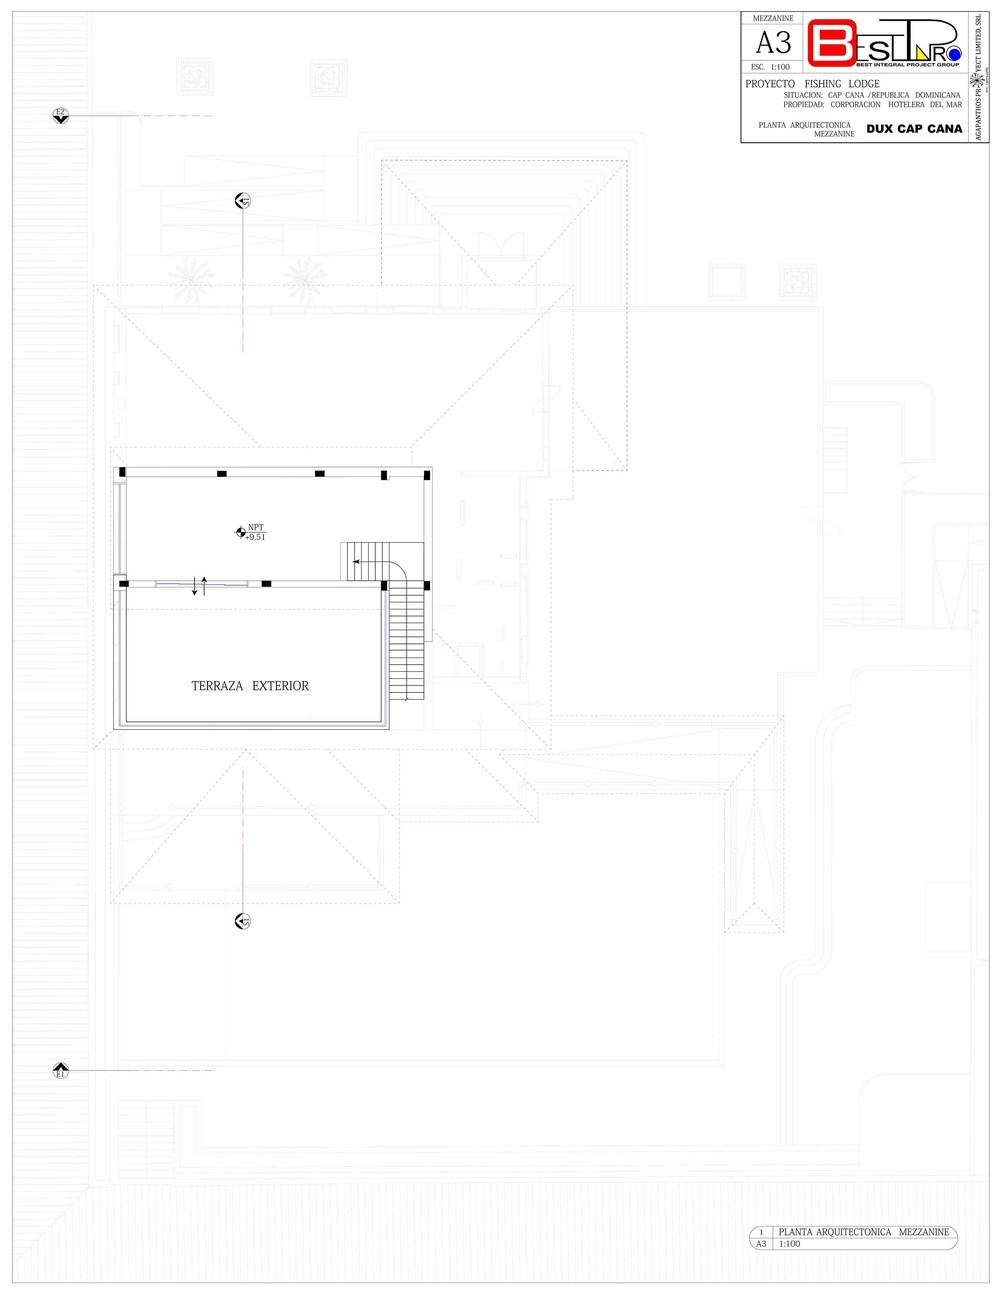 DUX mezzanine - 12-07-12.jpg